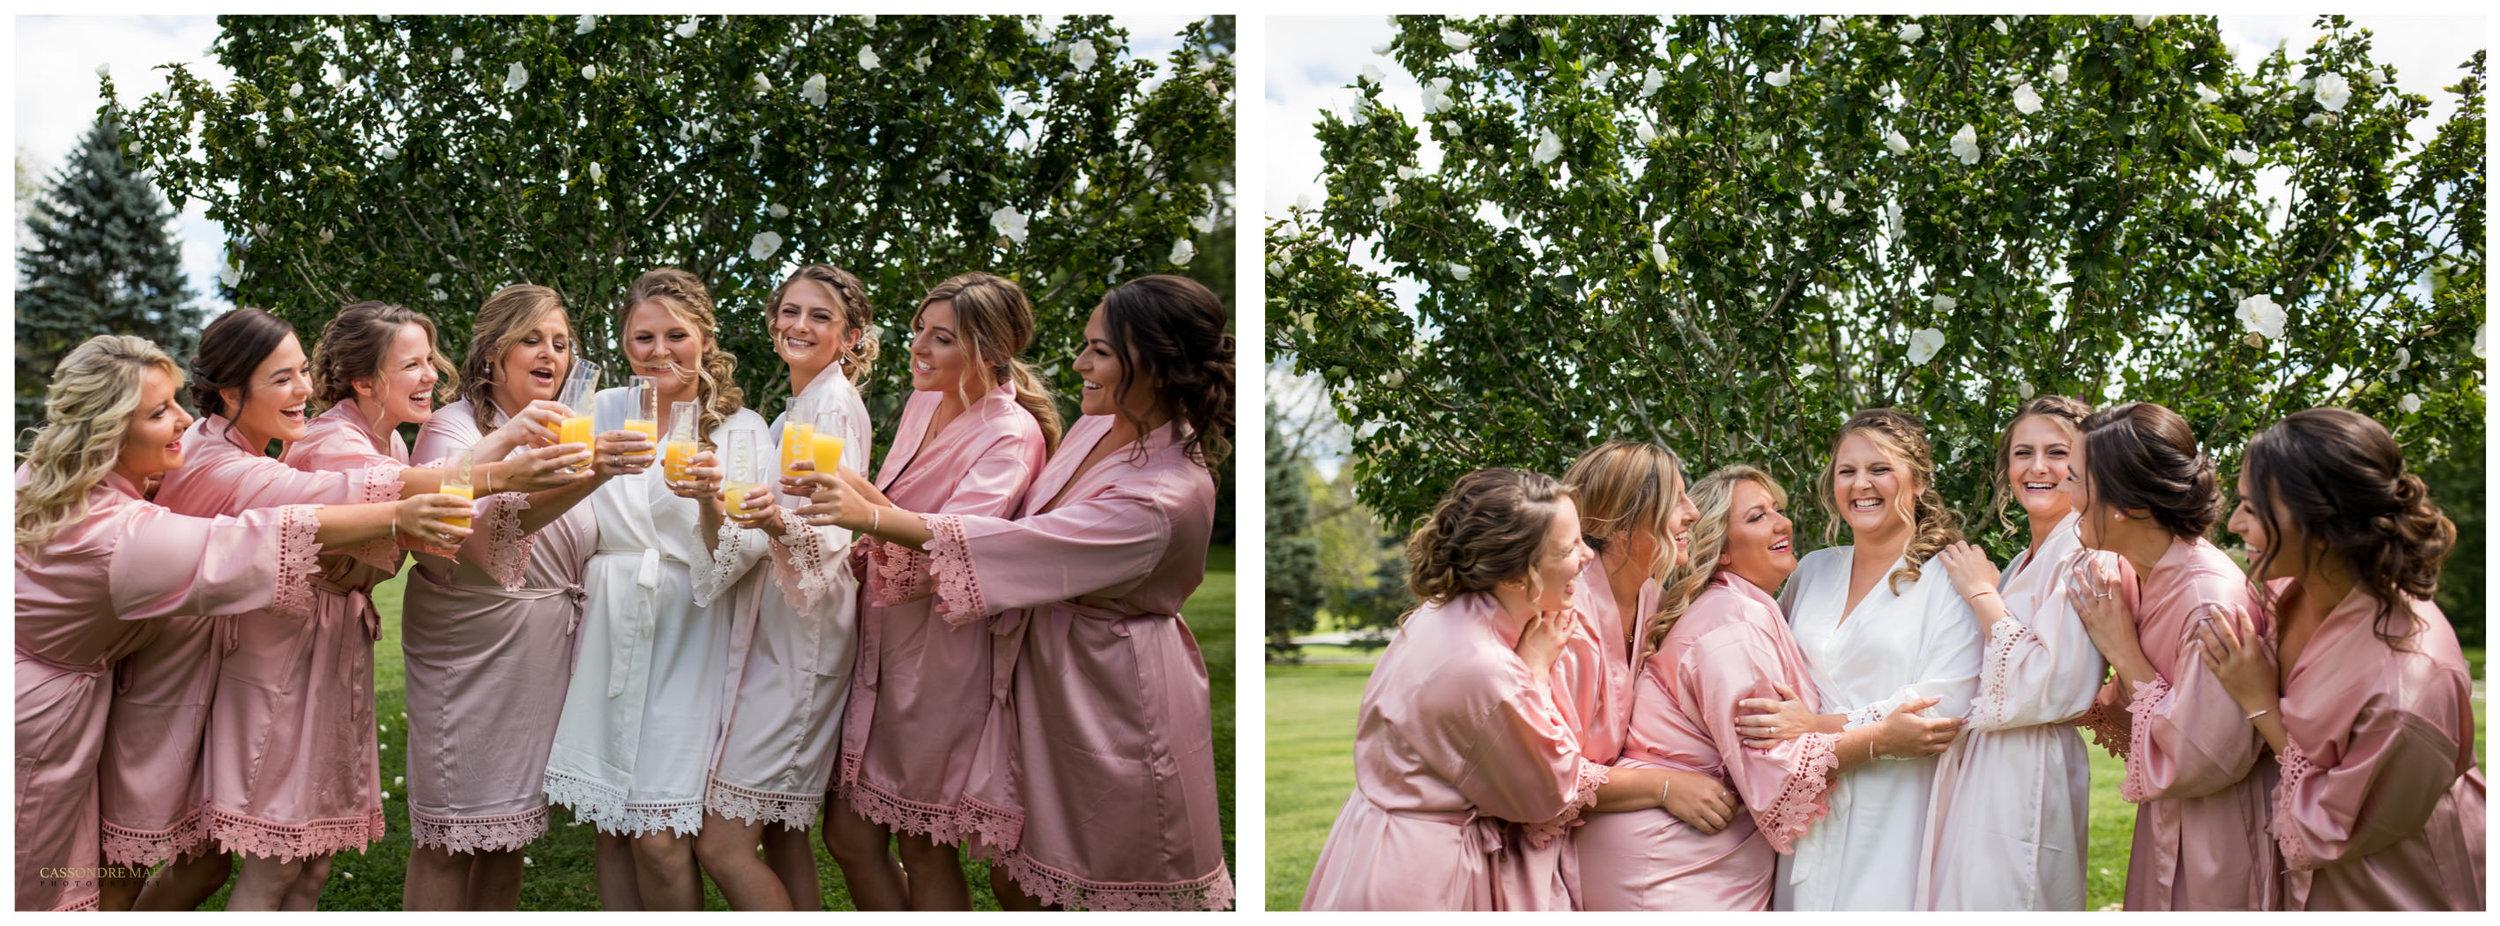 Cassondre Mae Photography The Links Wedding Photographer 6.jpg